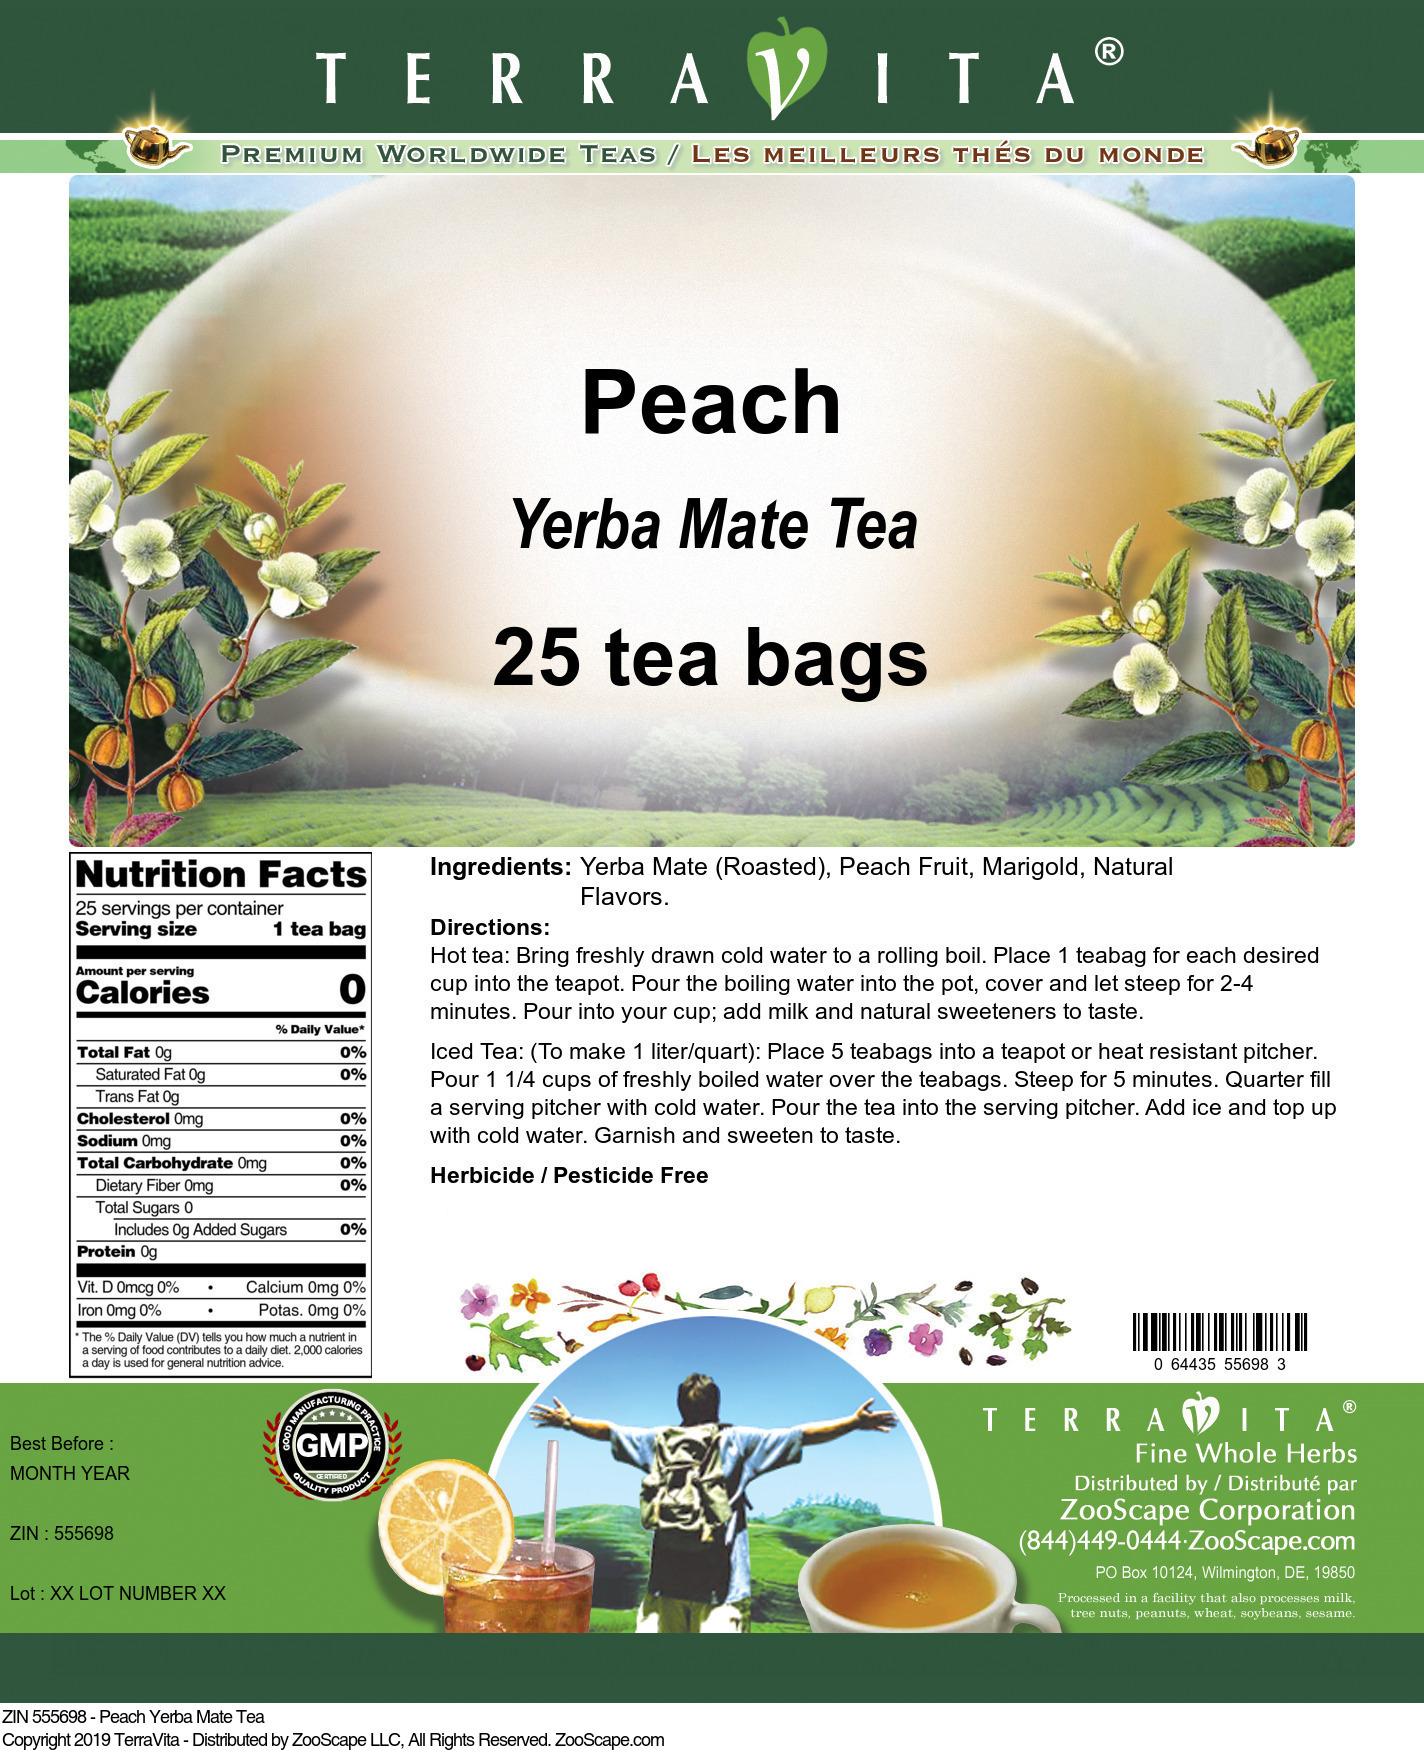 Peach Yerba Mate Tea